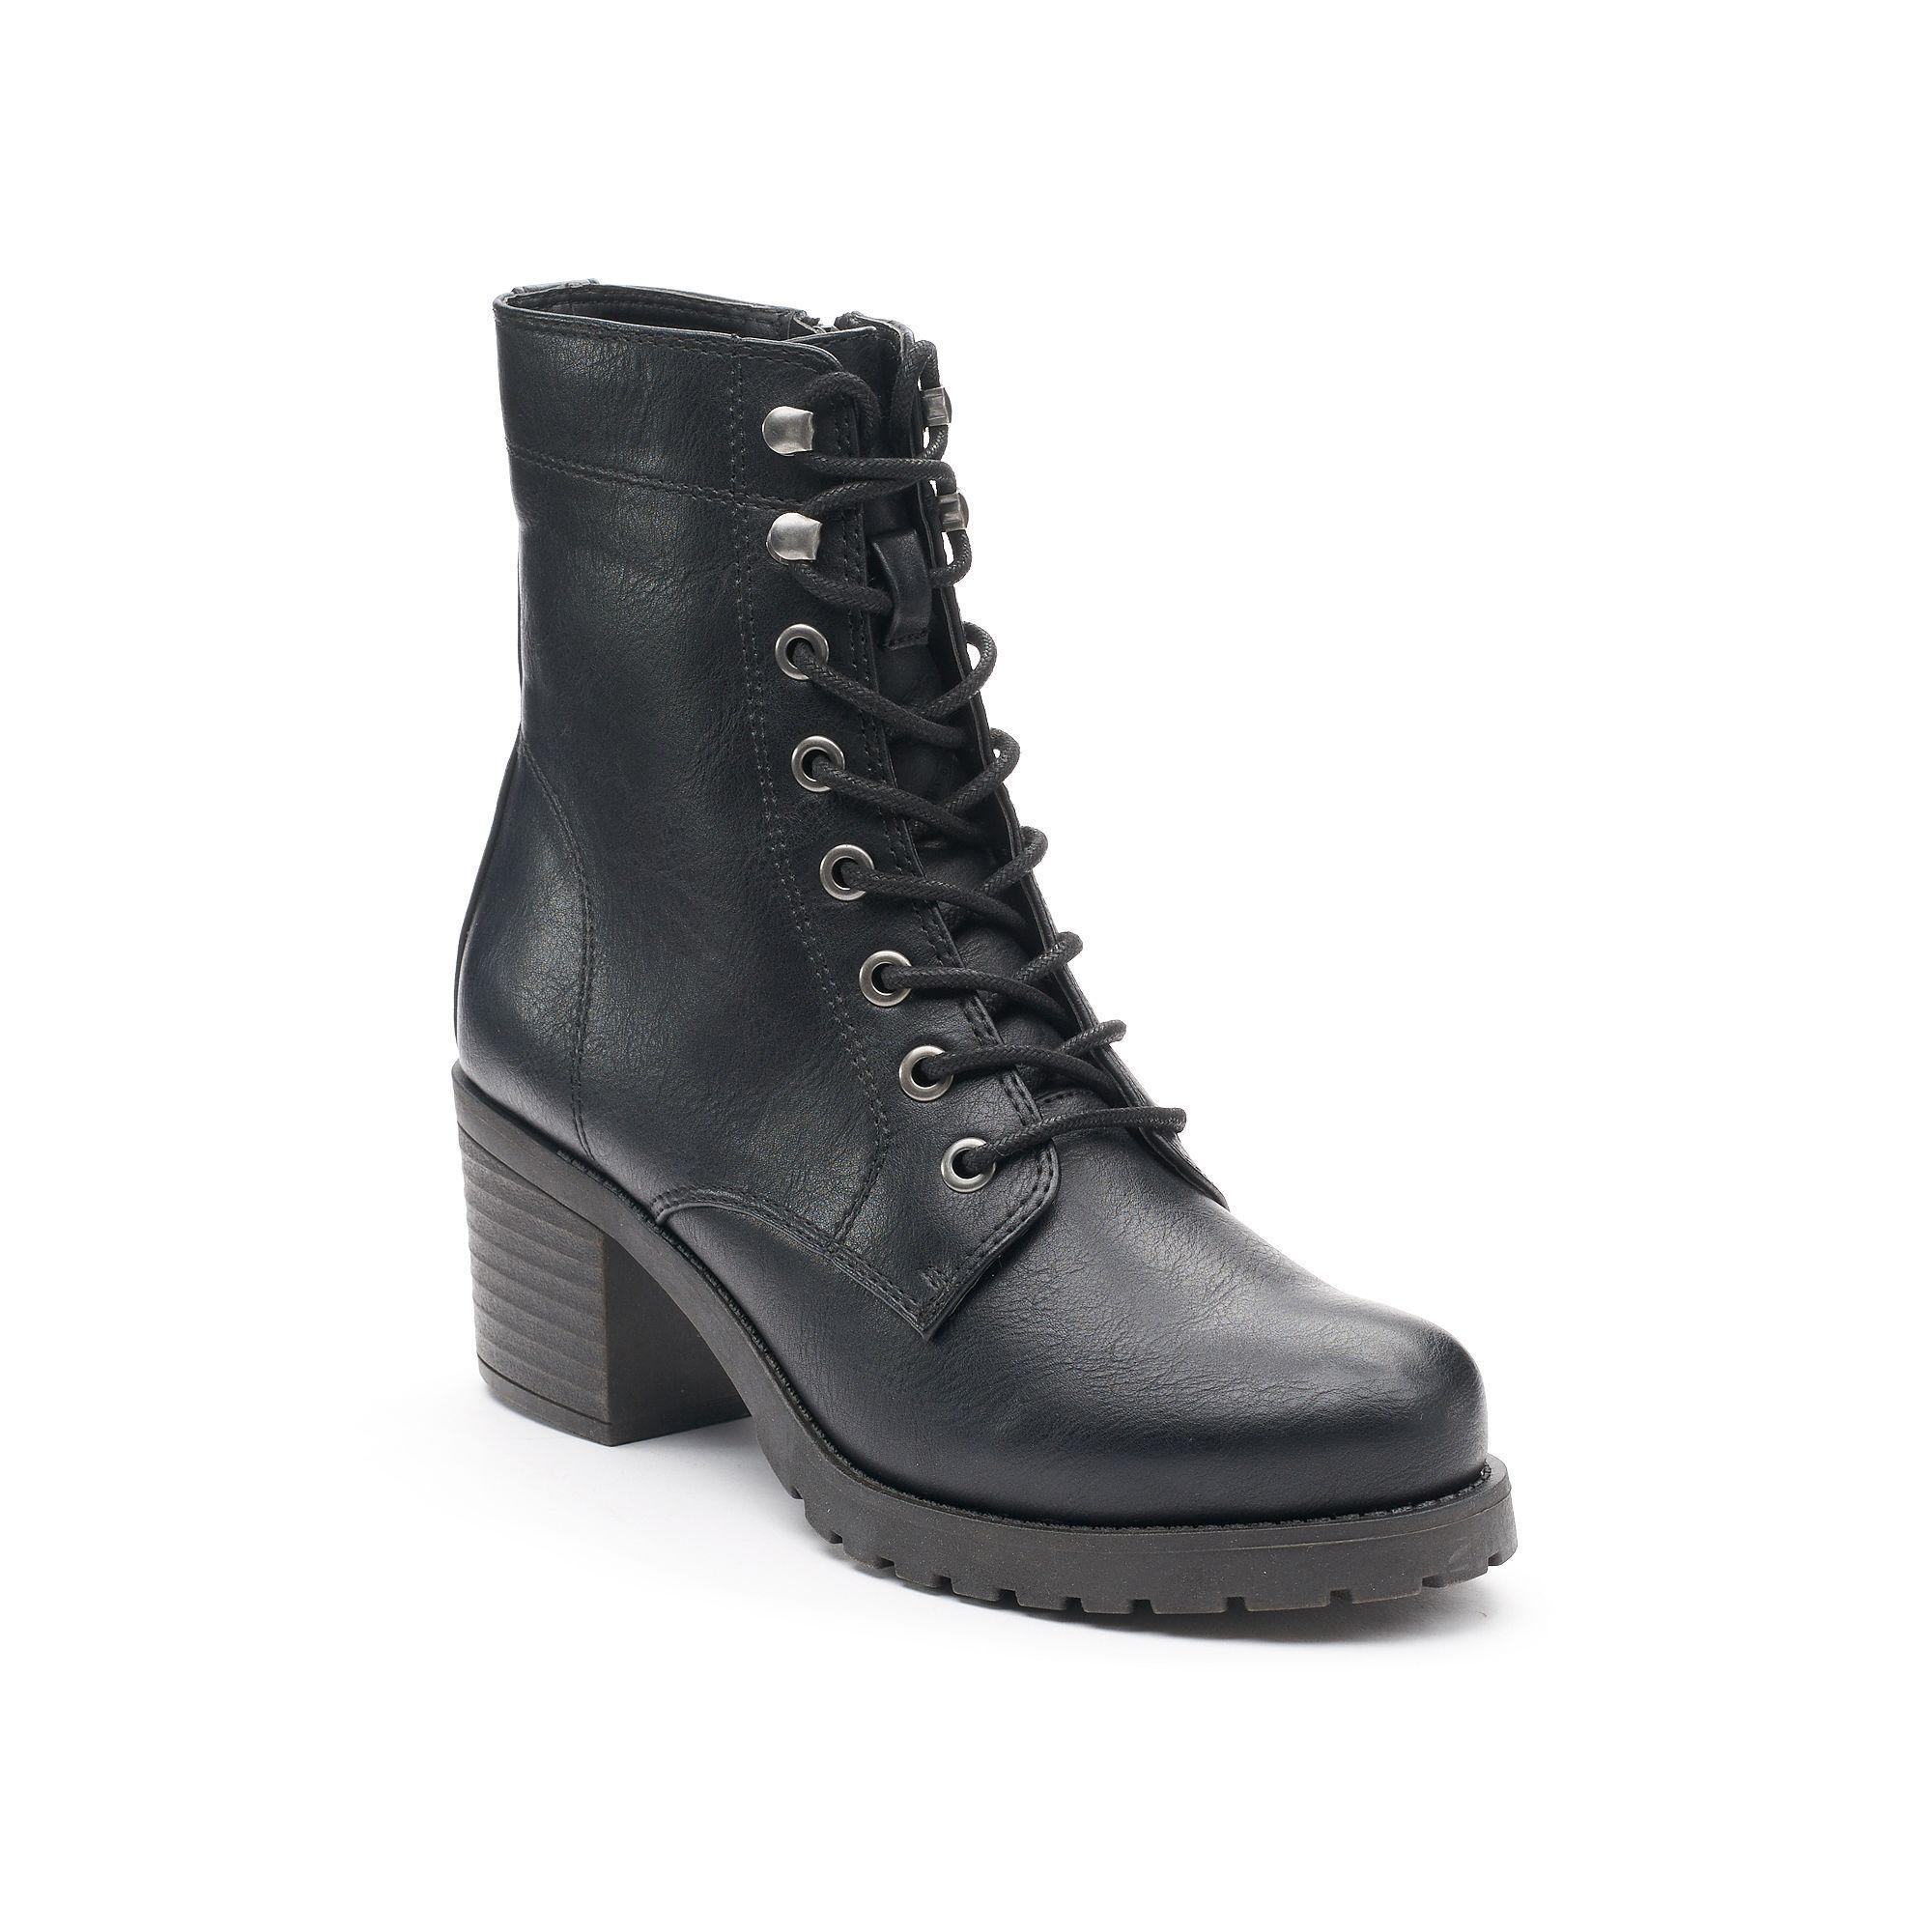 madden NYC Josiee Women's High ... Heel Combat Boots WFQbPWnJ